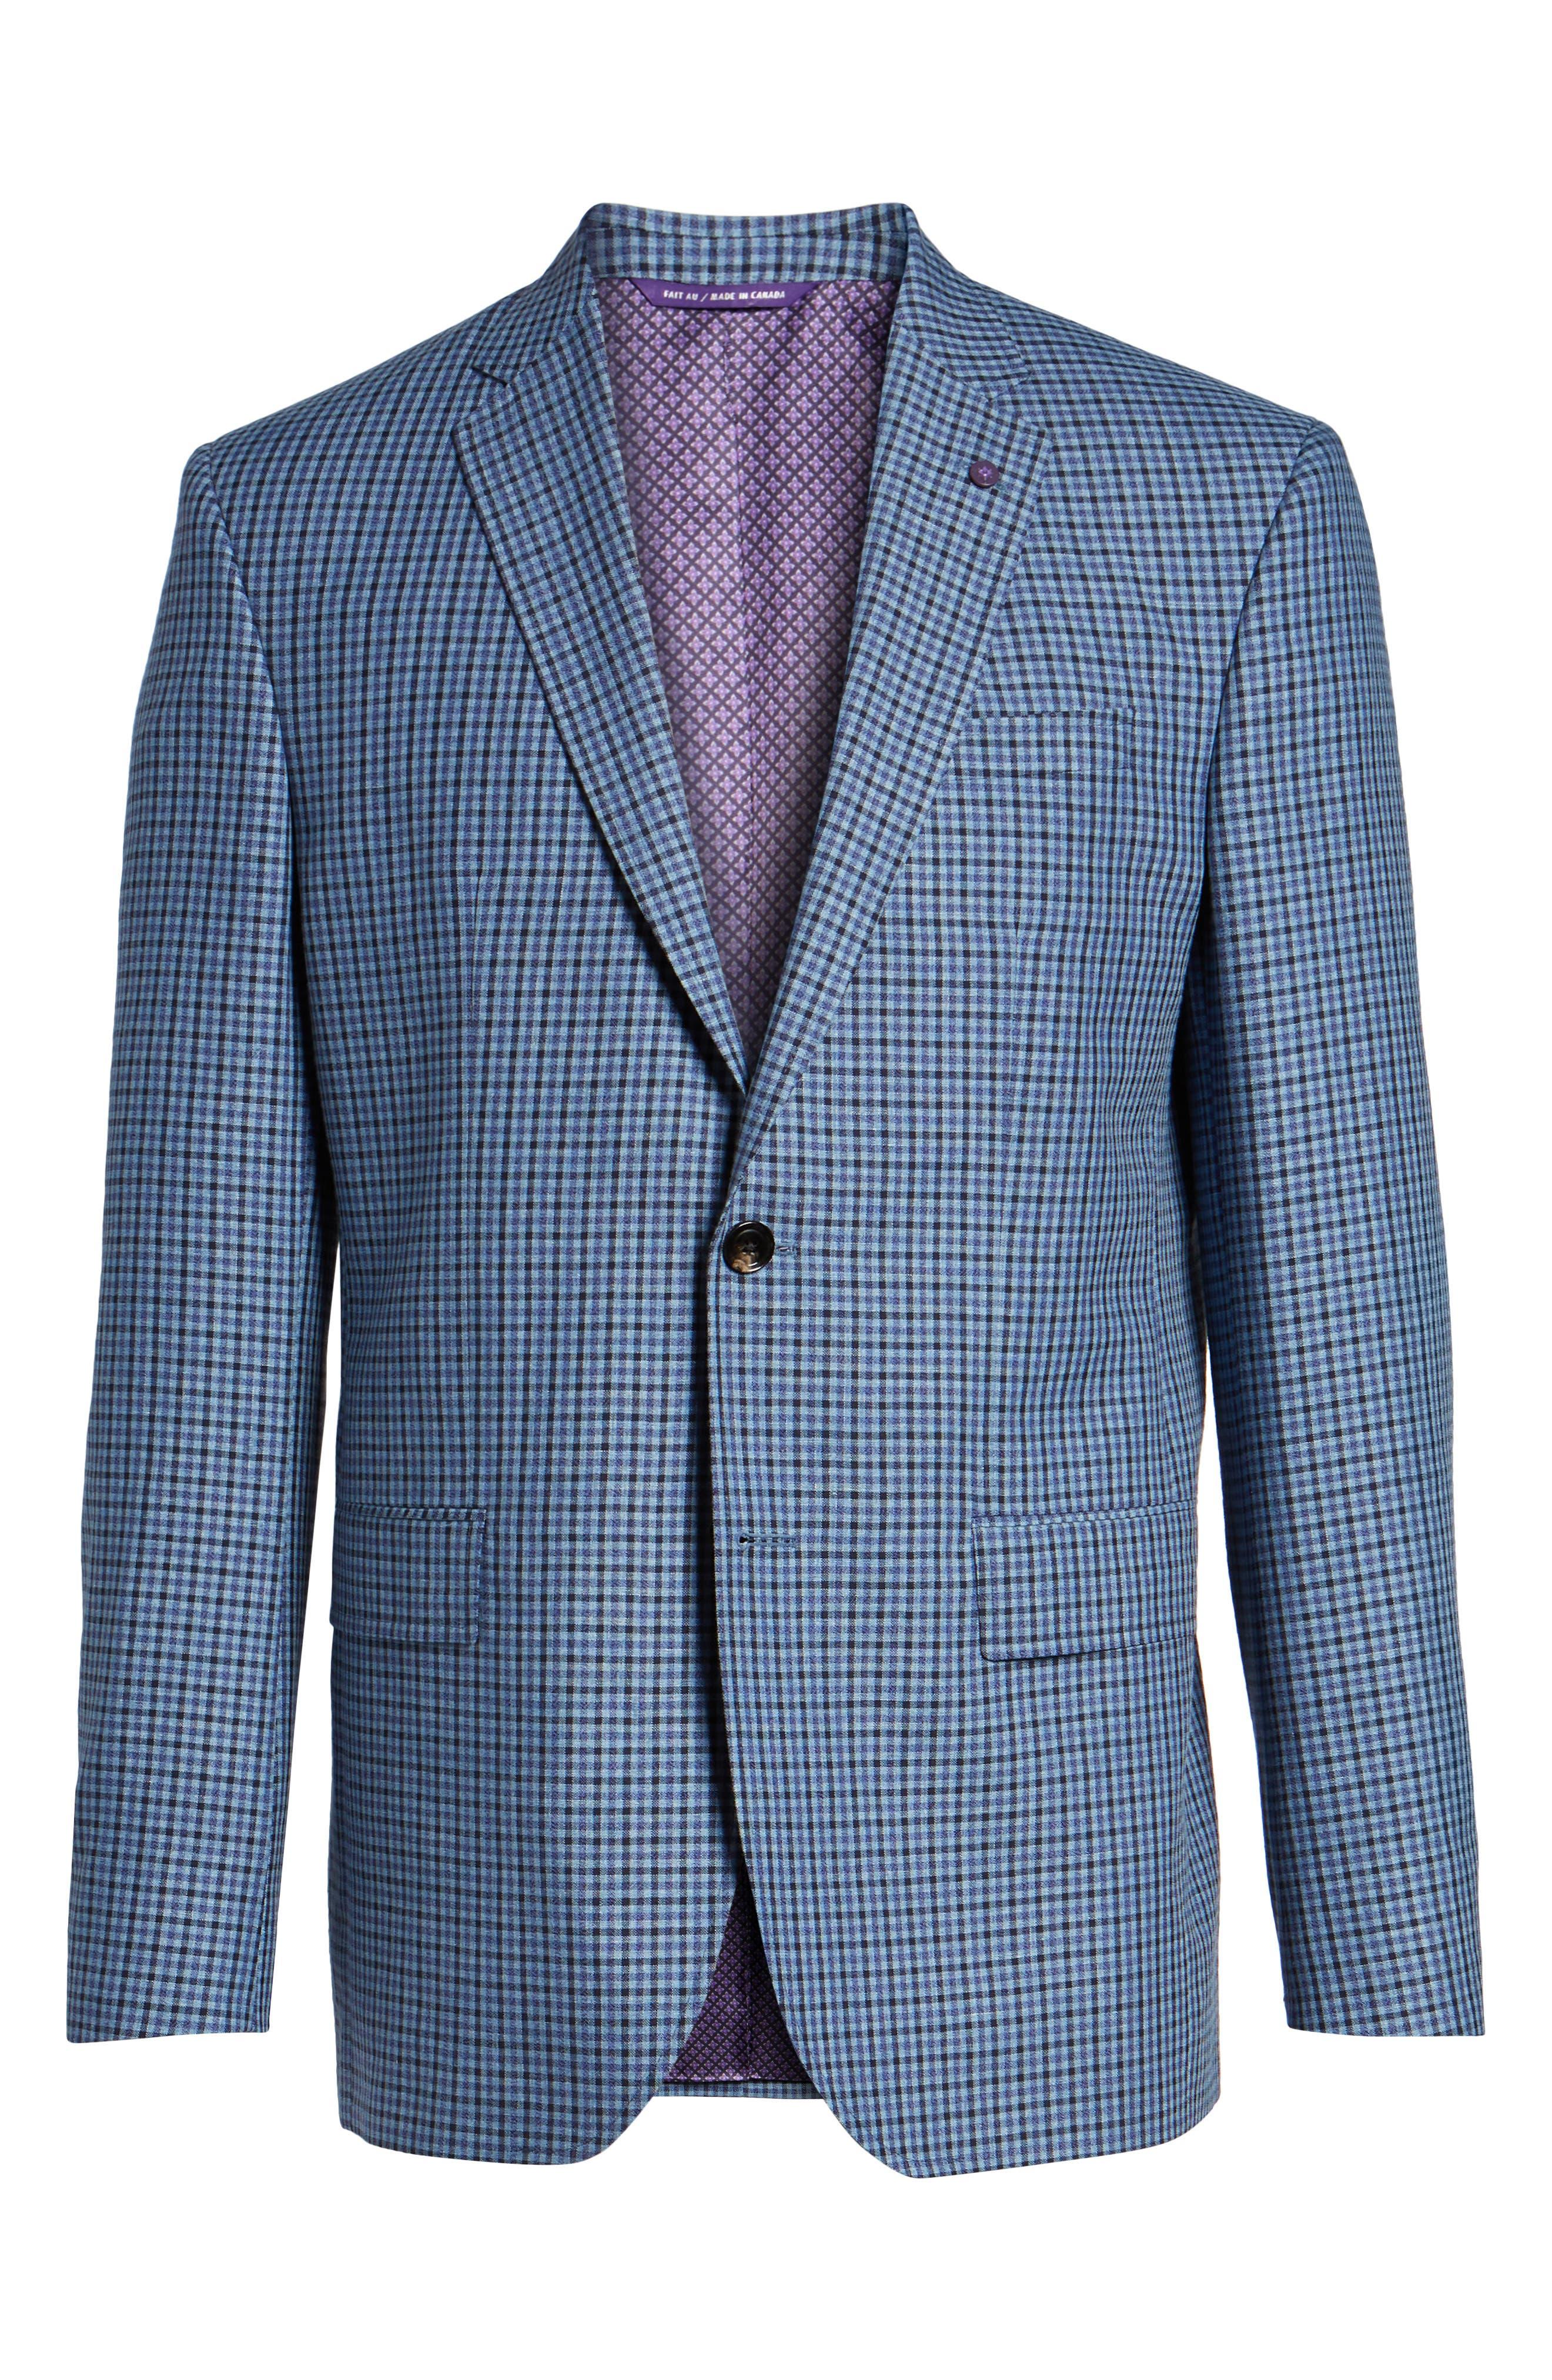 Jay Trim Fit Check Wool & Linen Sport Coat,                             Alternate thumbnail 6, color,                             Blue